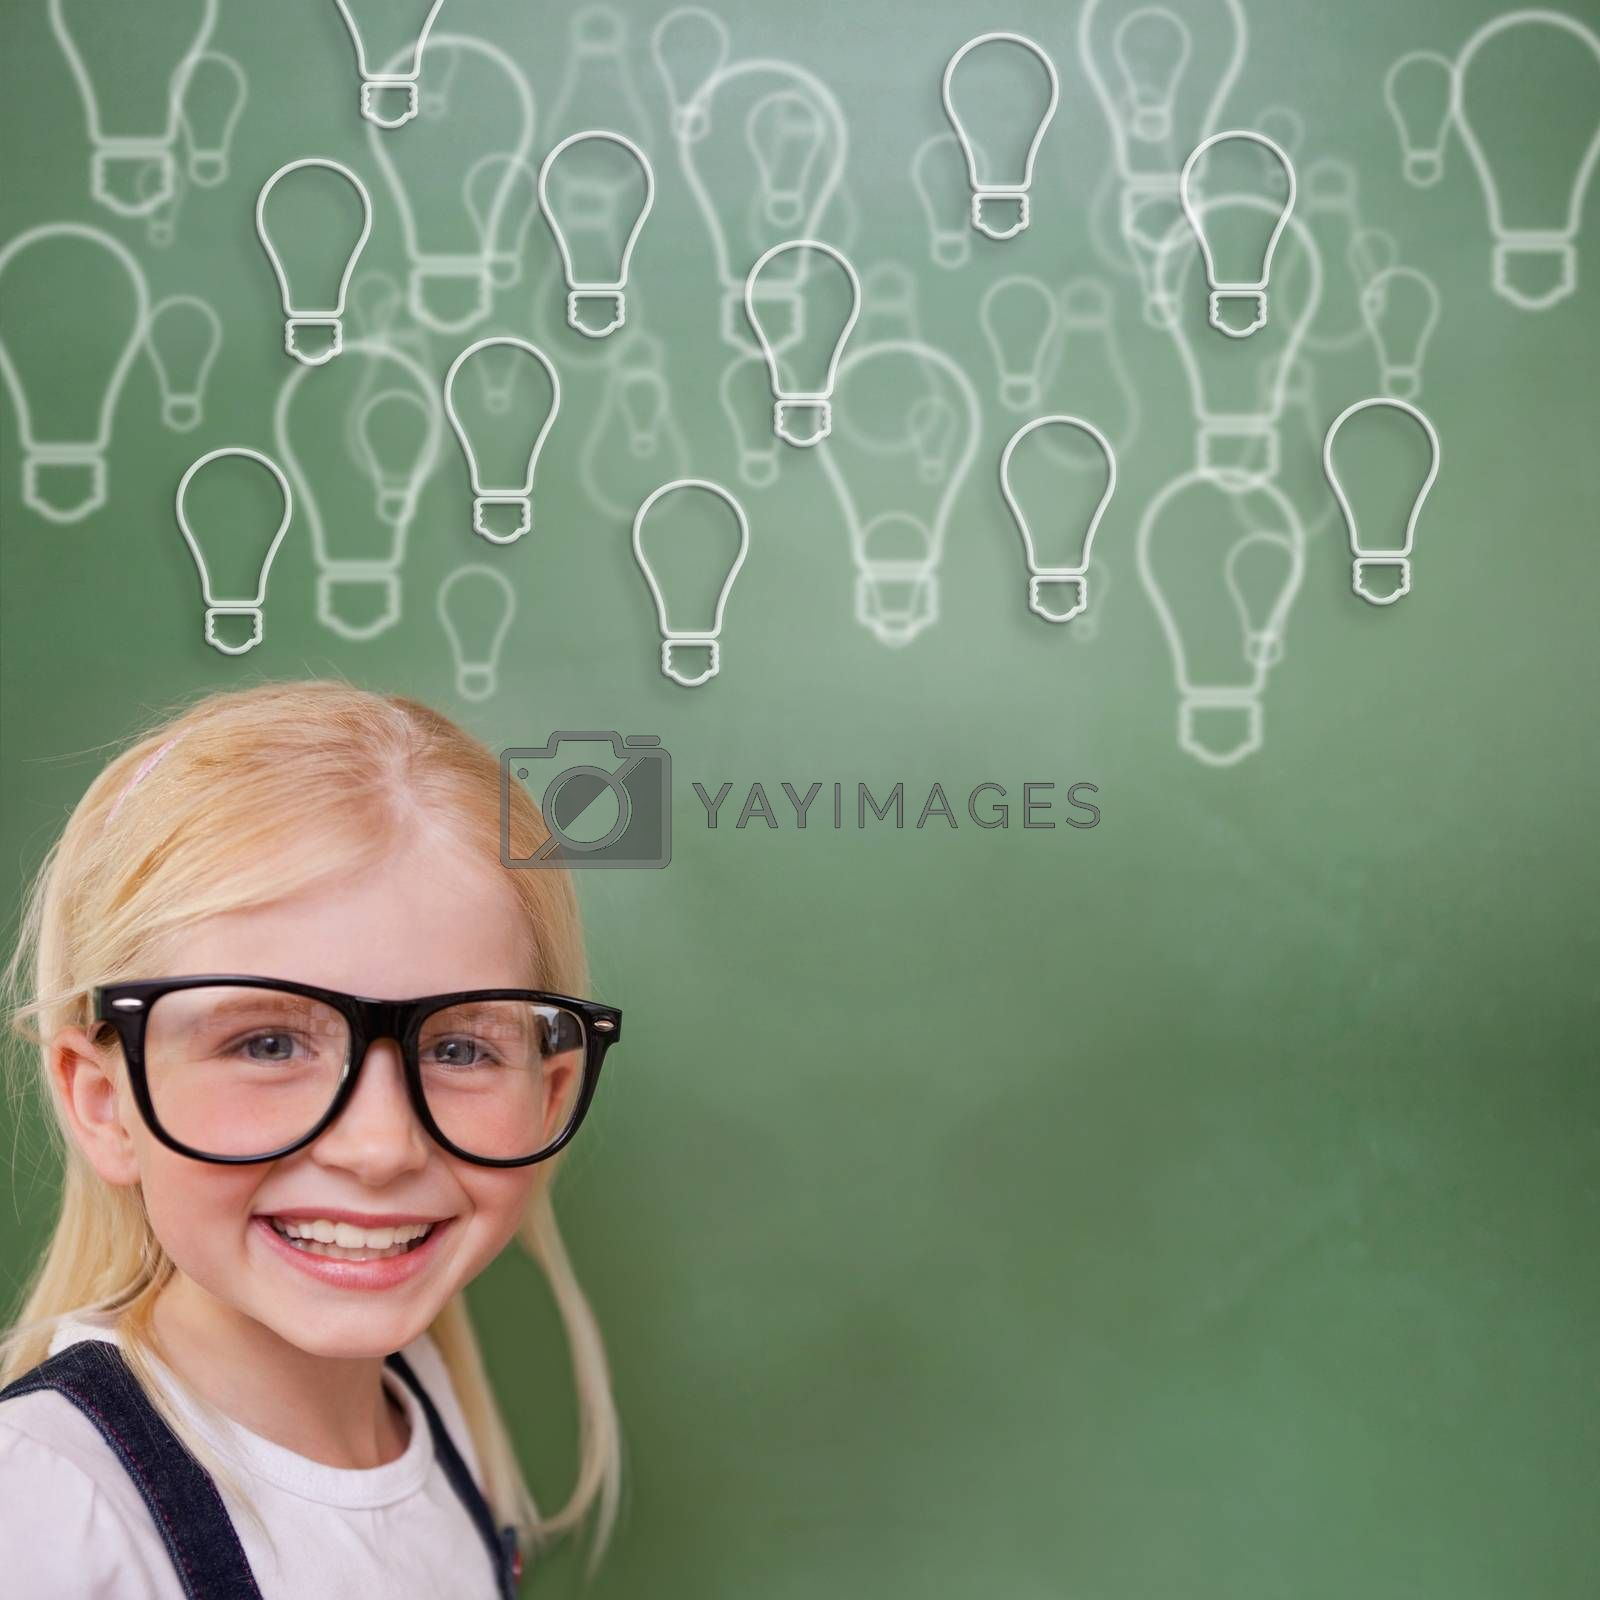 Cute pupil smiling against light bulbs